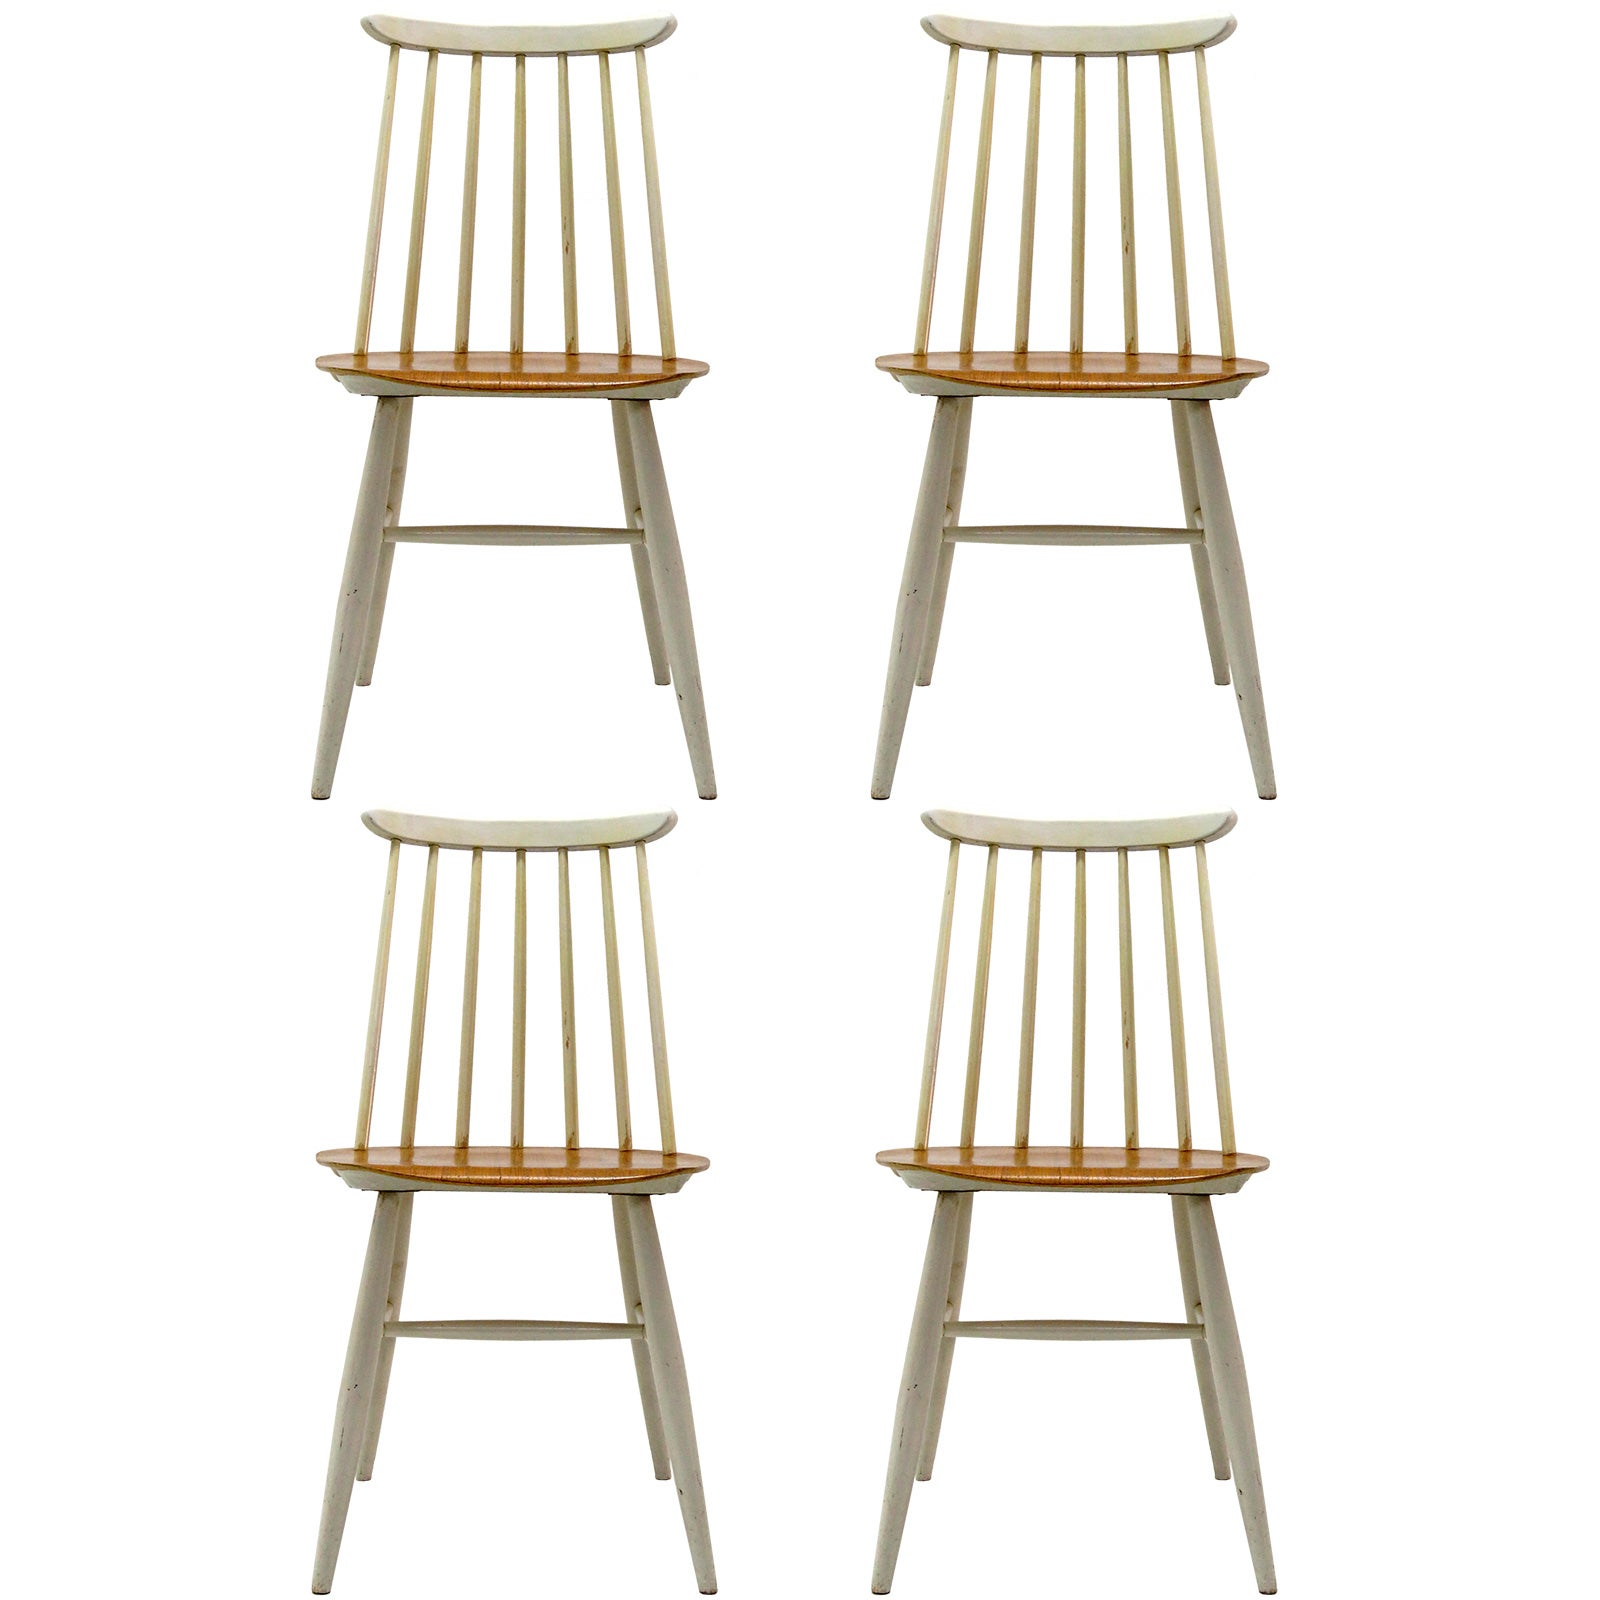 Set of Four Ilmari Tapiovaara Dining Chairs